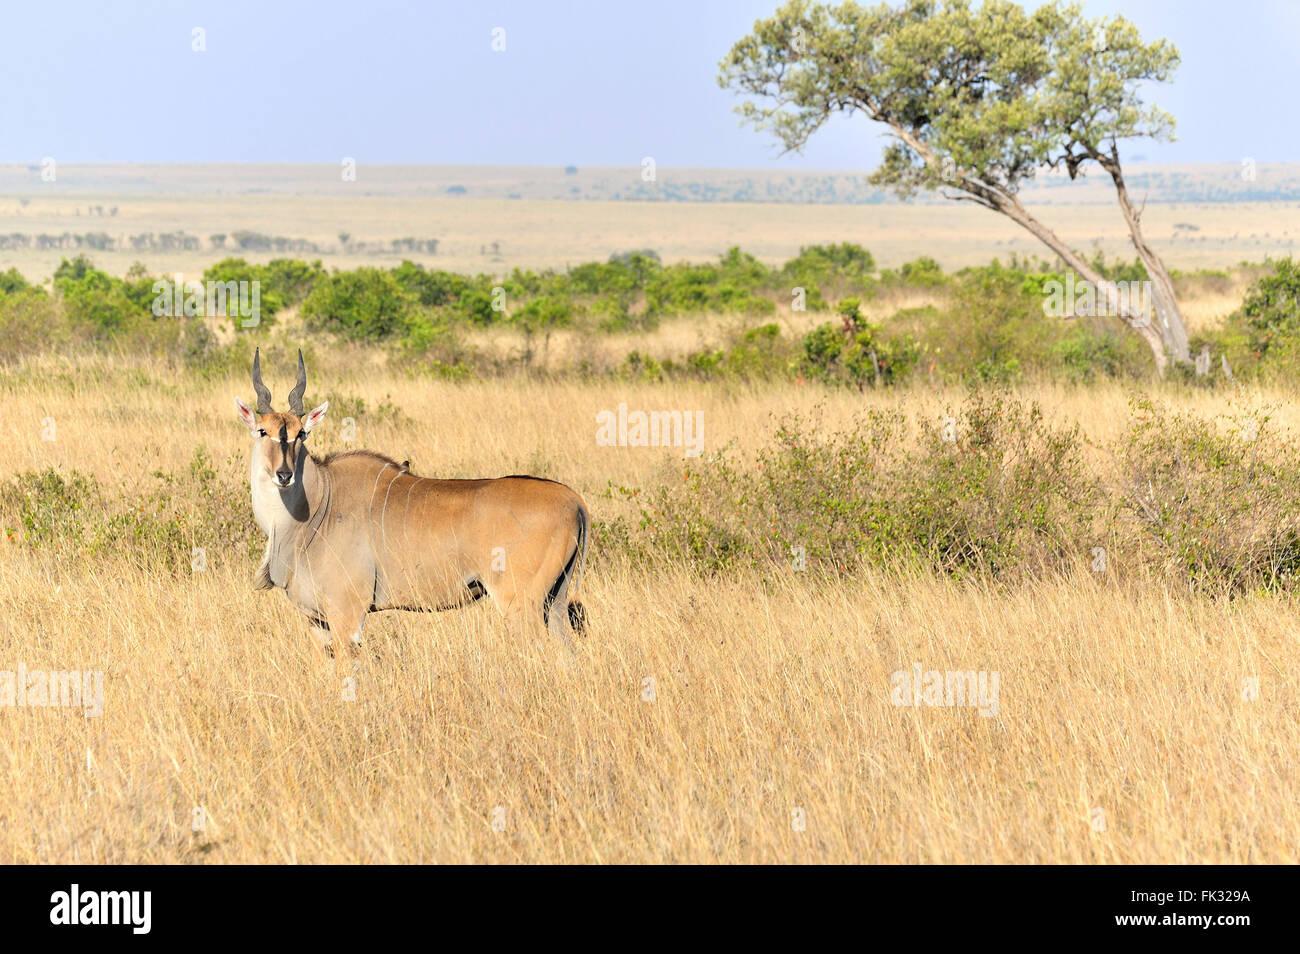 Eland Antelope, Taurotragus oryx, in Masai Mara - Stock Image